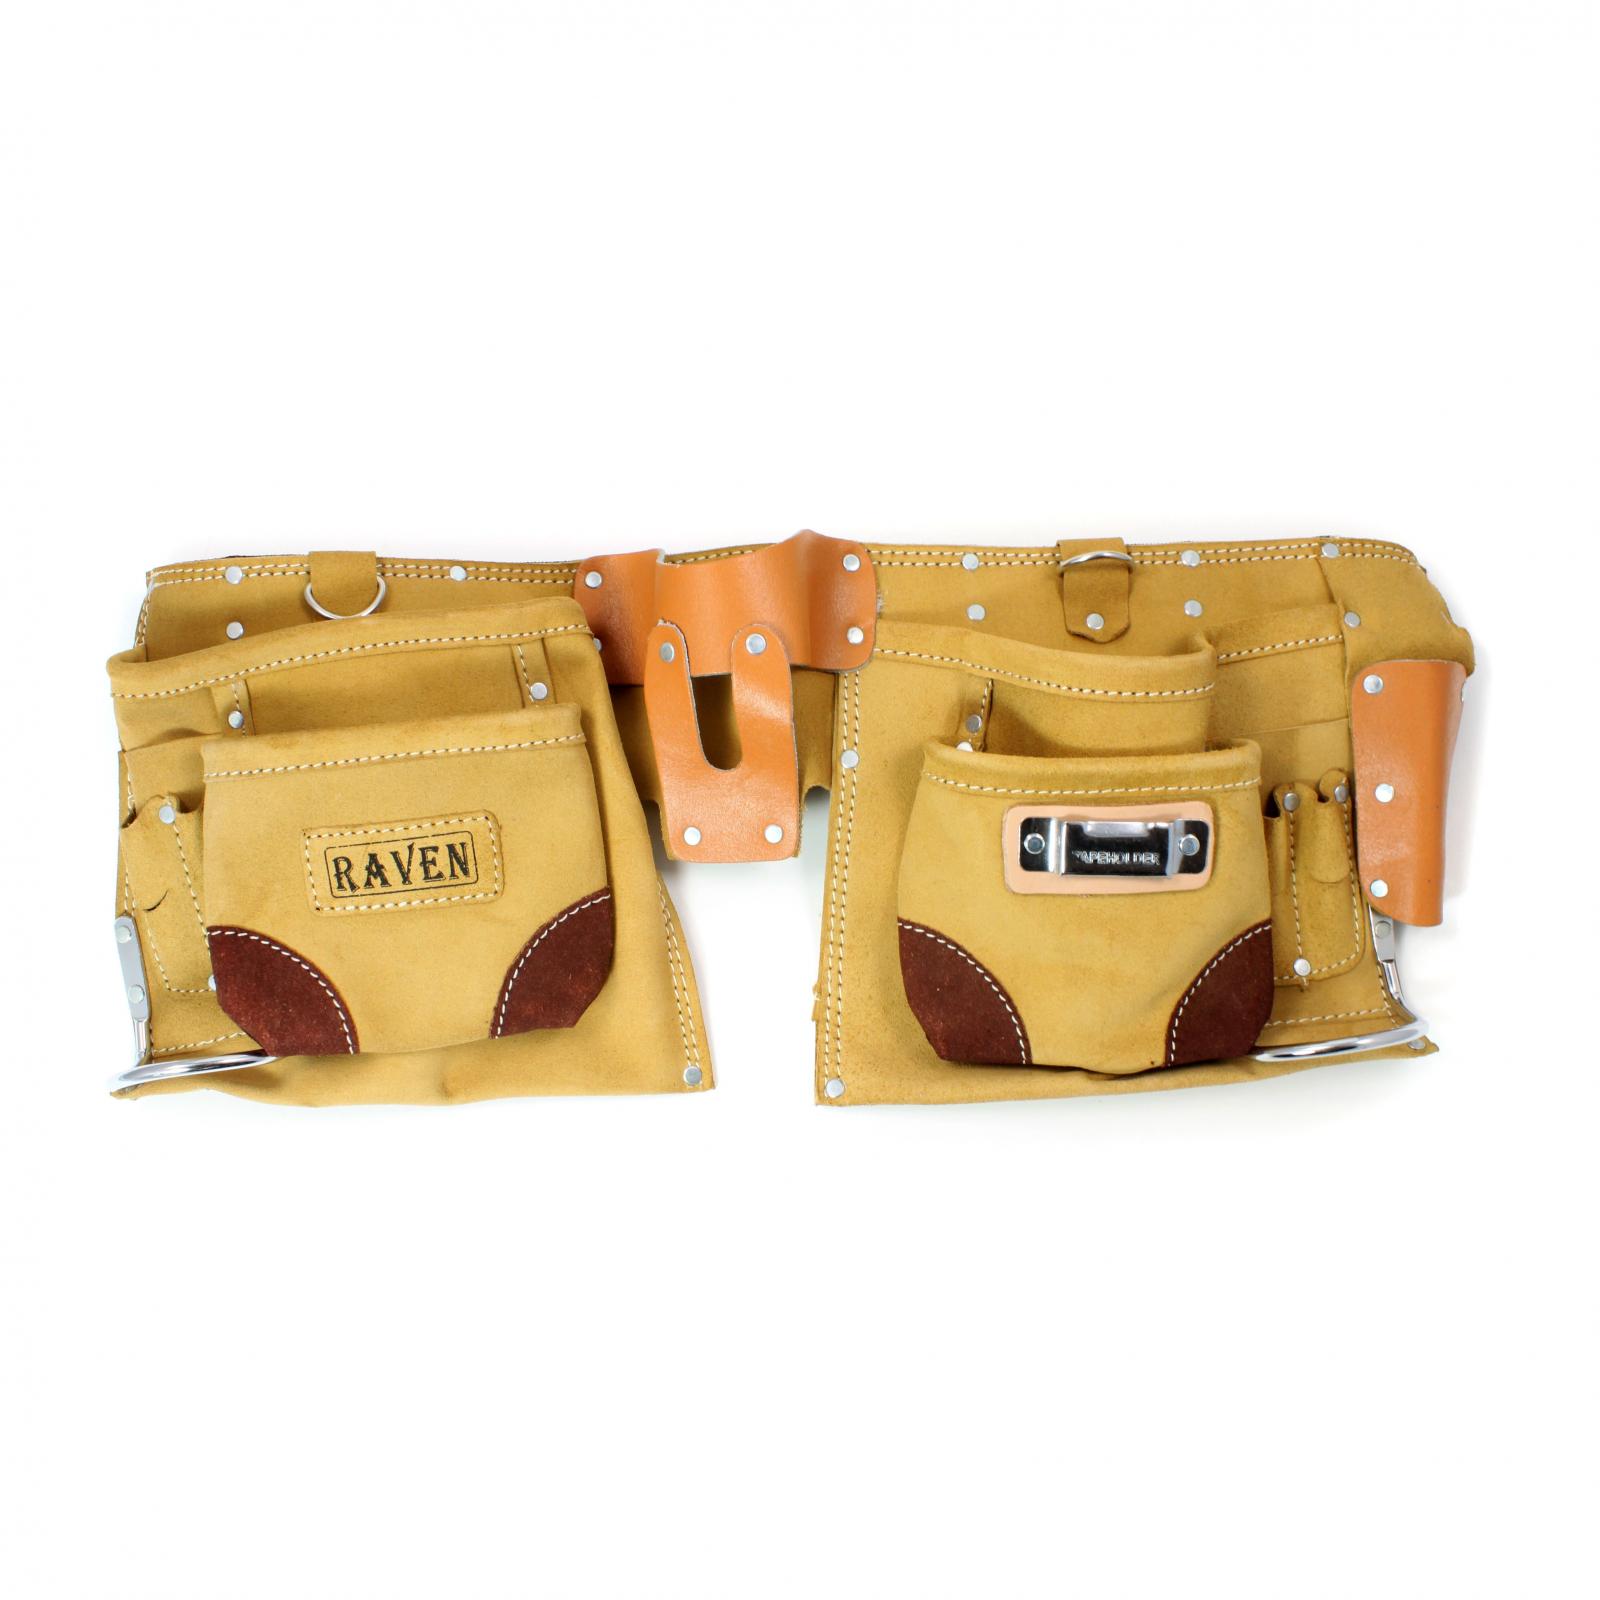 Deluxe Tool Belt 12 Pocket Carpenters Storage